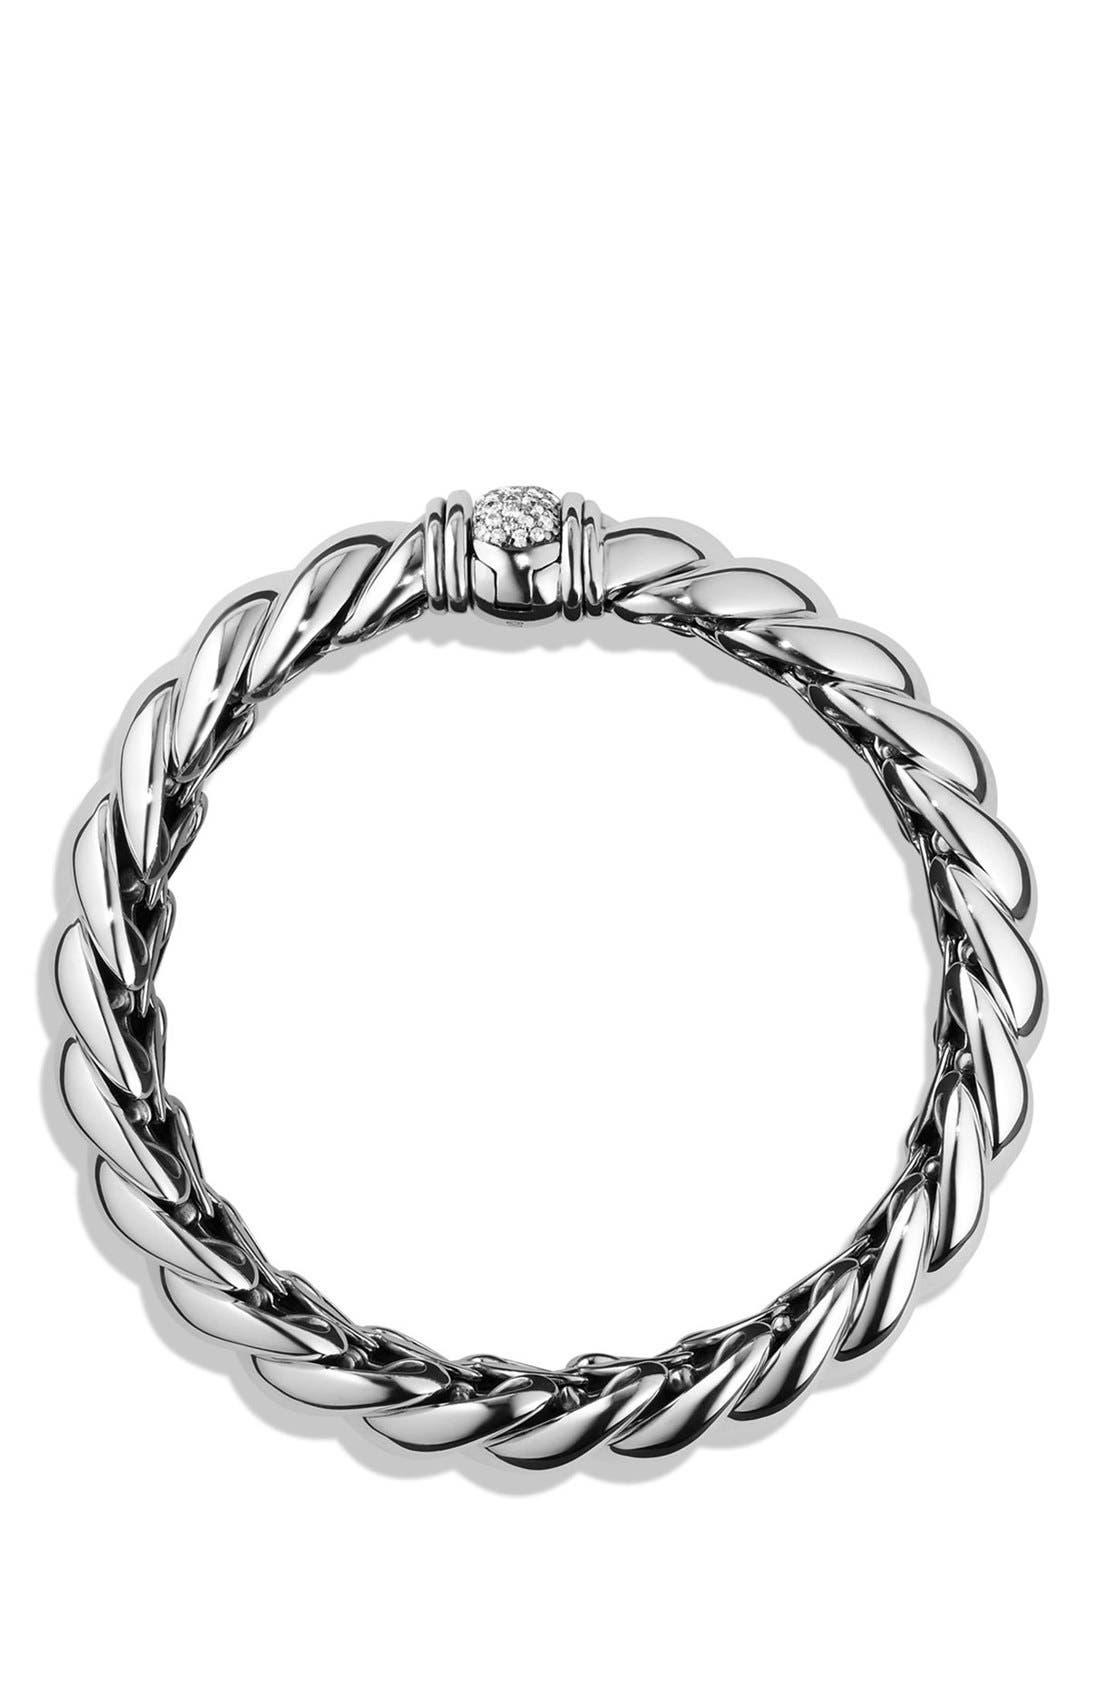 Alternate Image 1 Selected - David Yurman 'Hampton' Bracelet with Diamonds